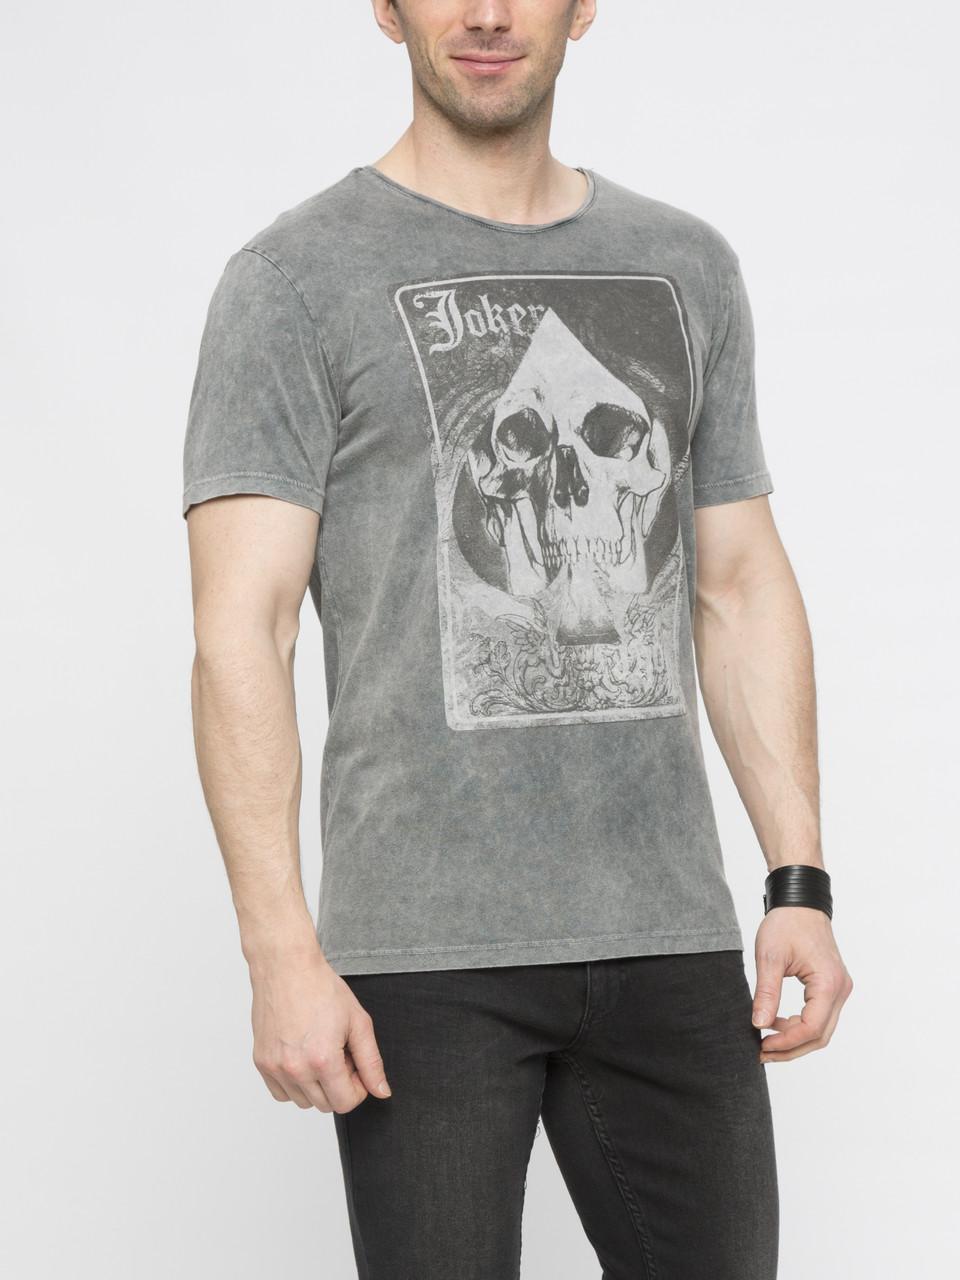 Мужская футболка LC Waikiki серого цвета с картинкой на груди